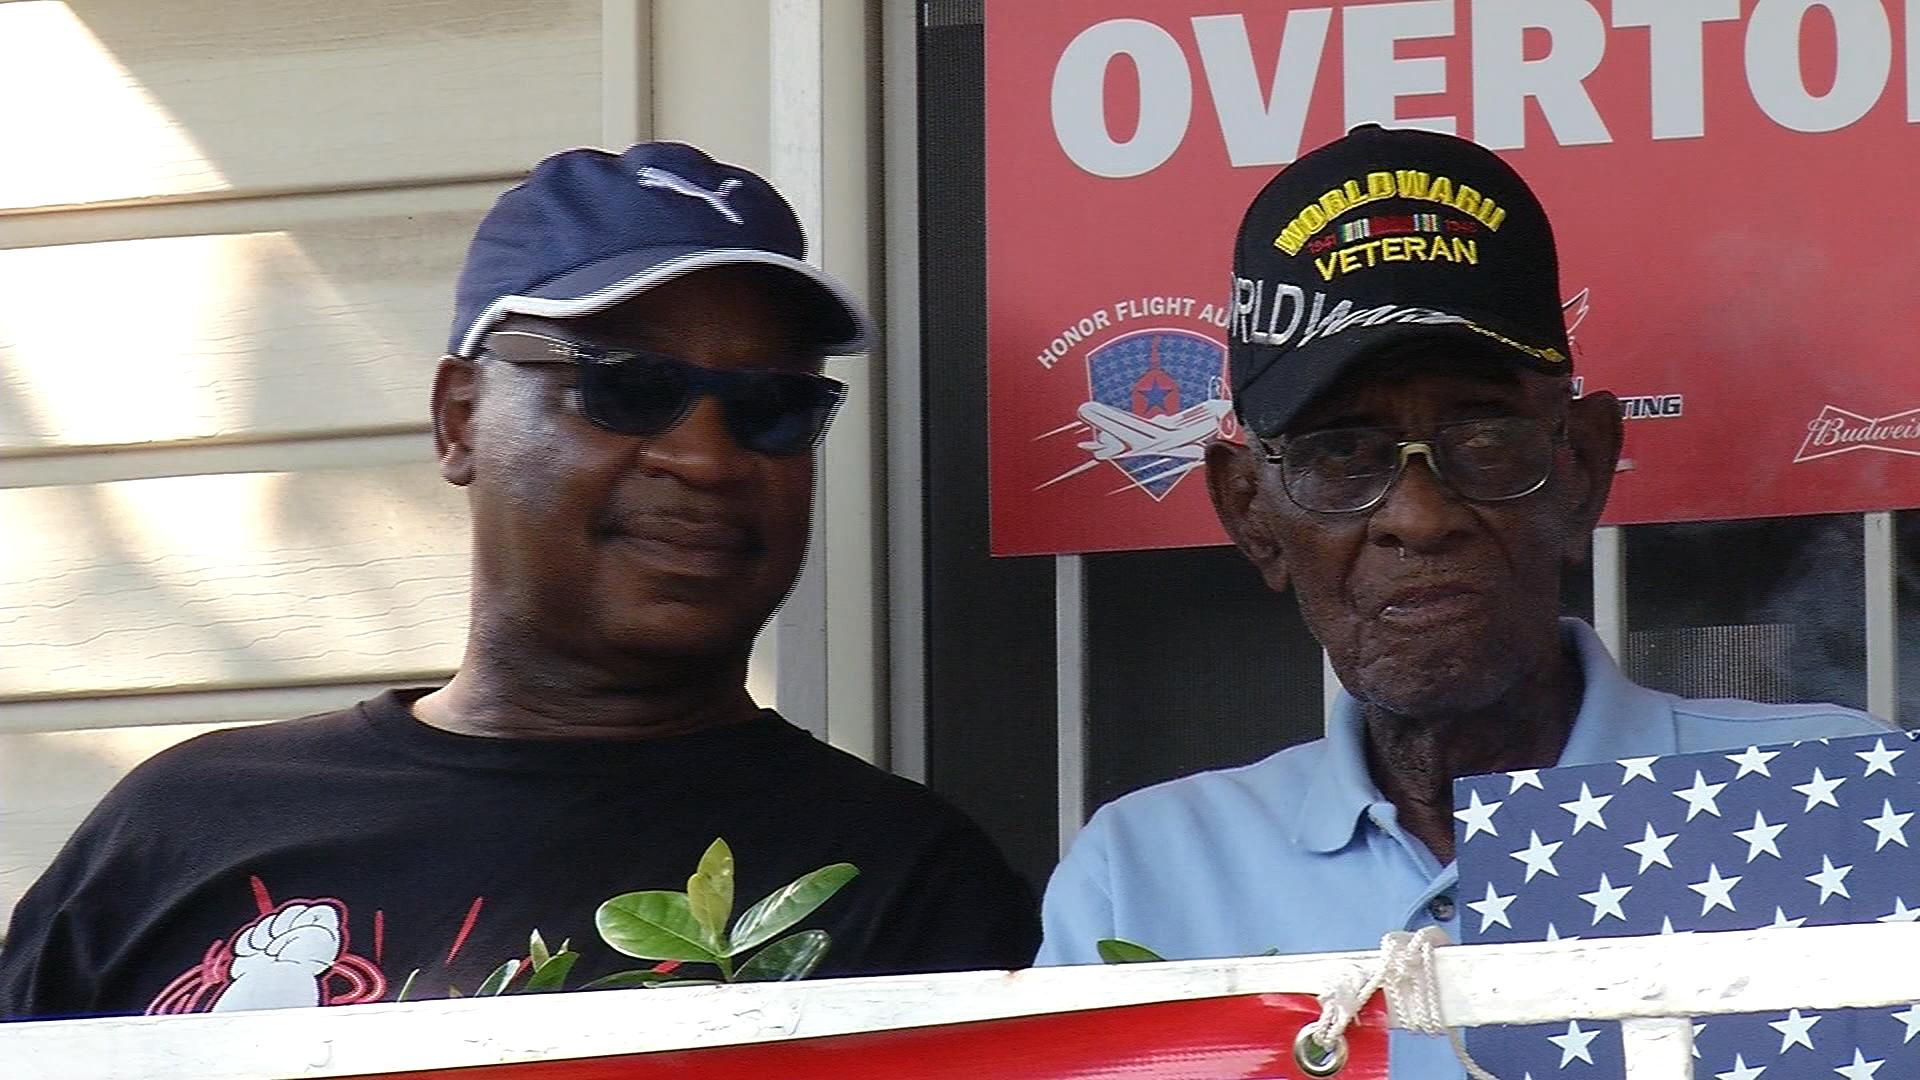 Richard Overton oldest WWII veteran-159532.jpg27183407